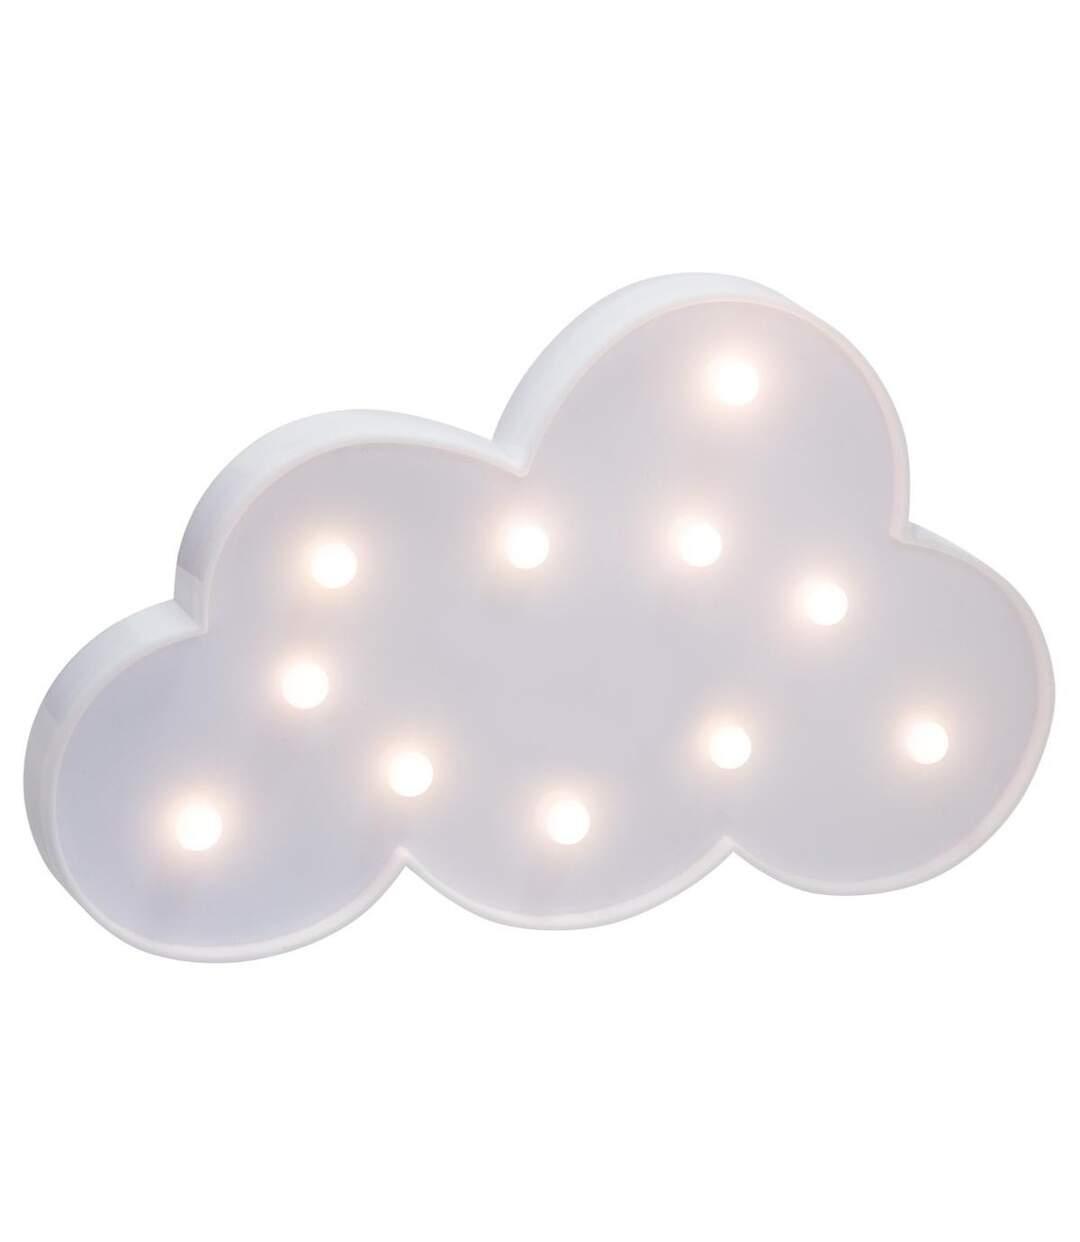 Atmosphera - Déco lumineuse Nuage 11 LED